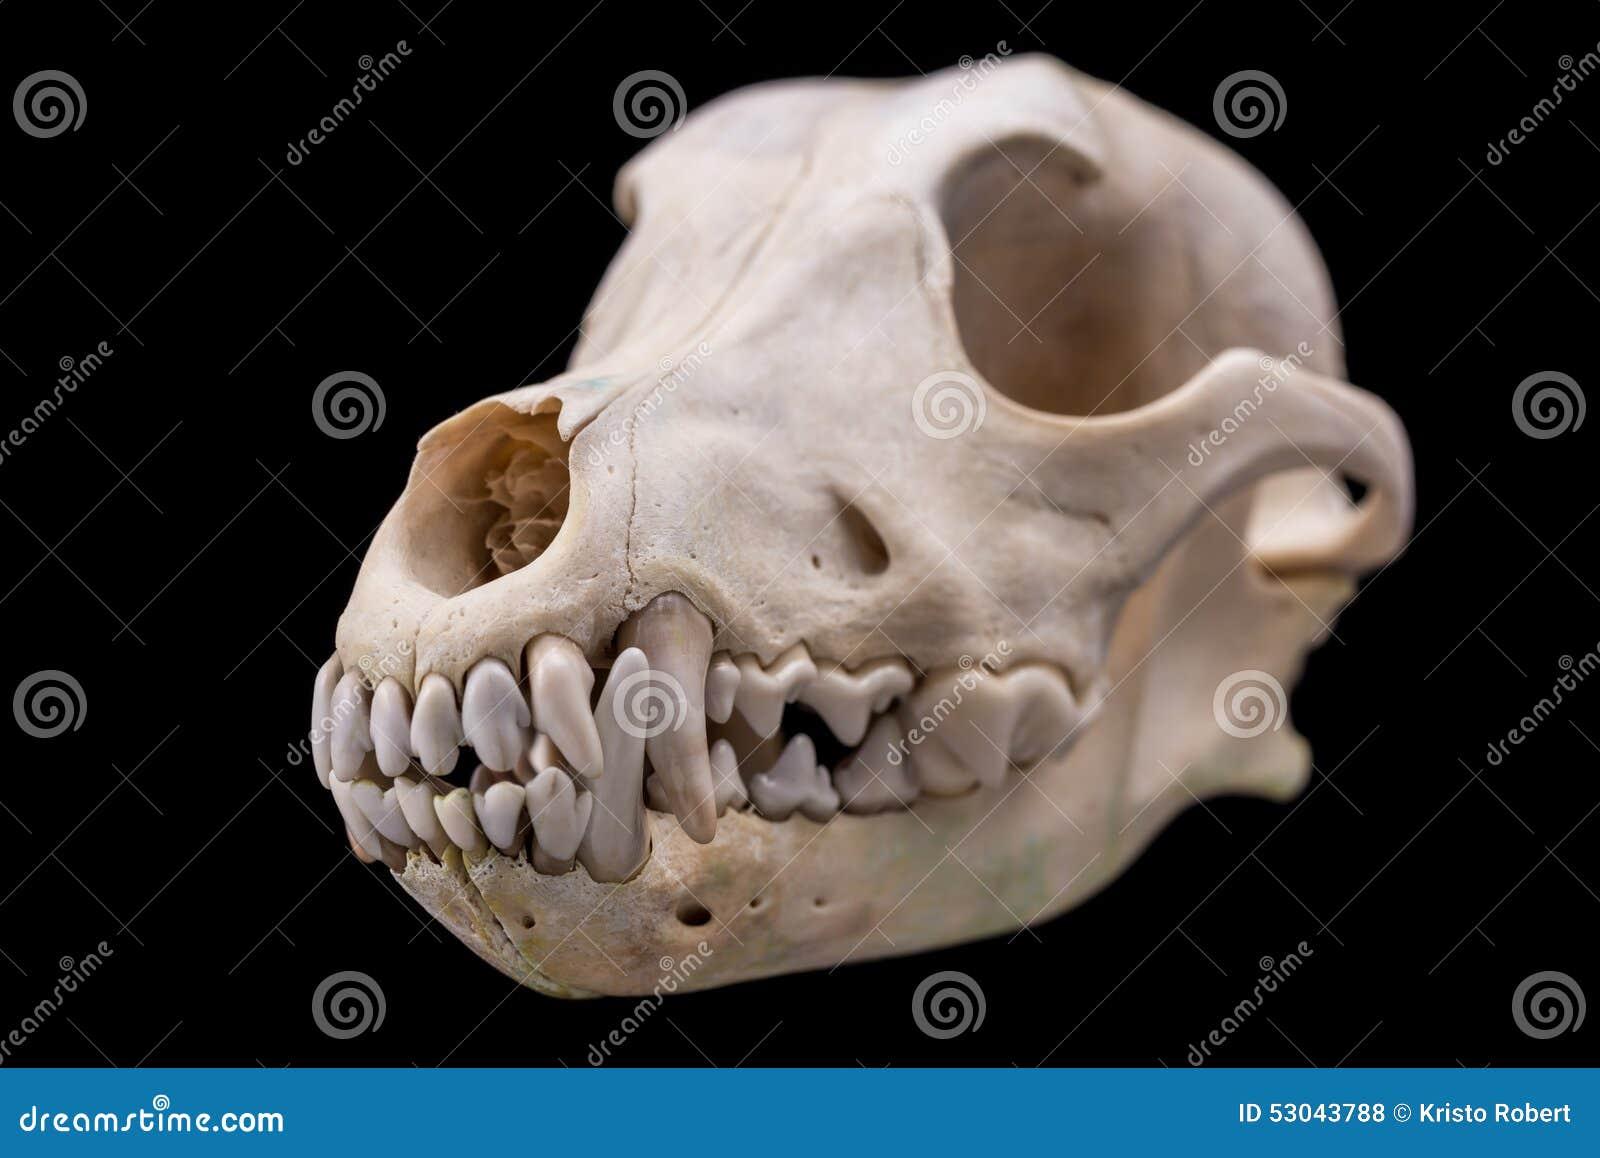 Animal skull. stock photo. Image of death, anatomy, body - 53043788